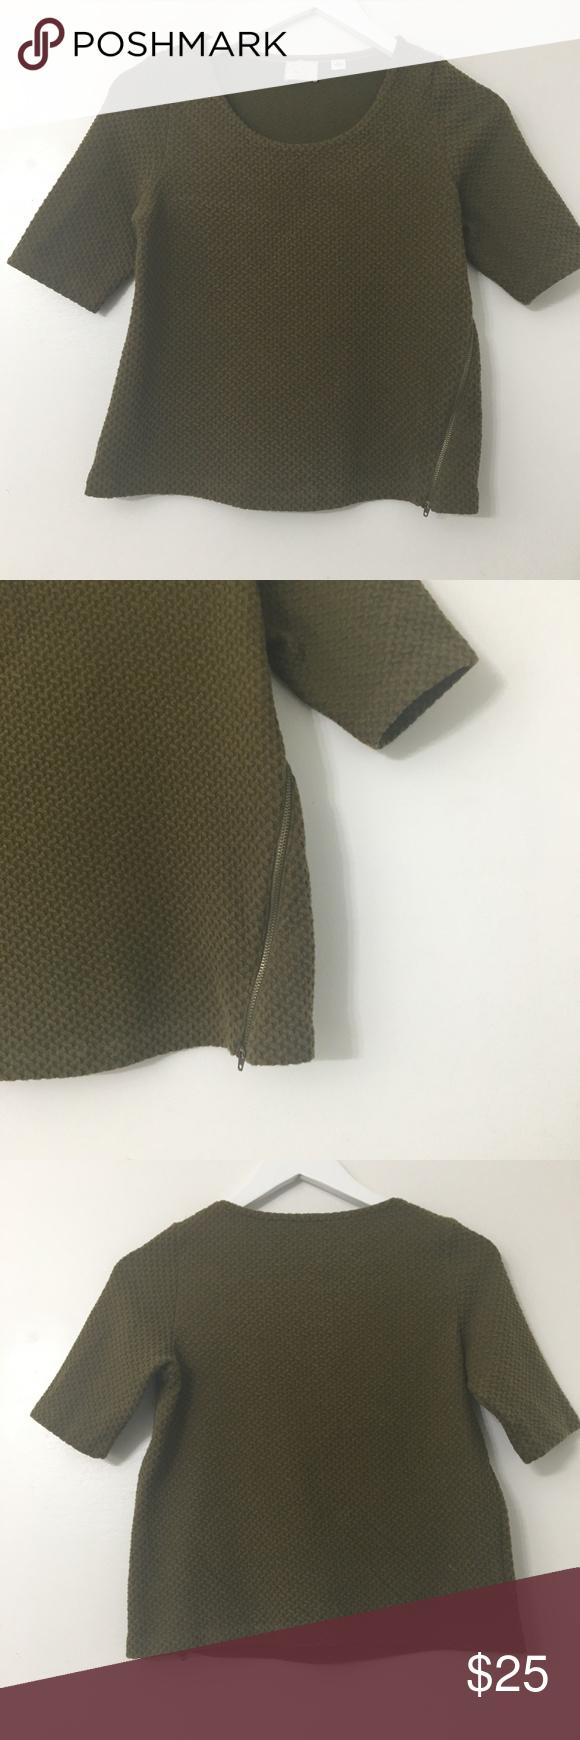 Photo of Anthro Postmark Textured Diagonal Zipper Top Anthro Postmark Sz: XS Green Textur…